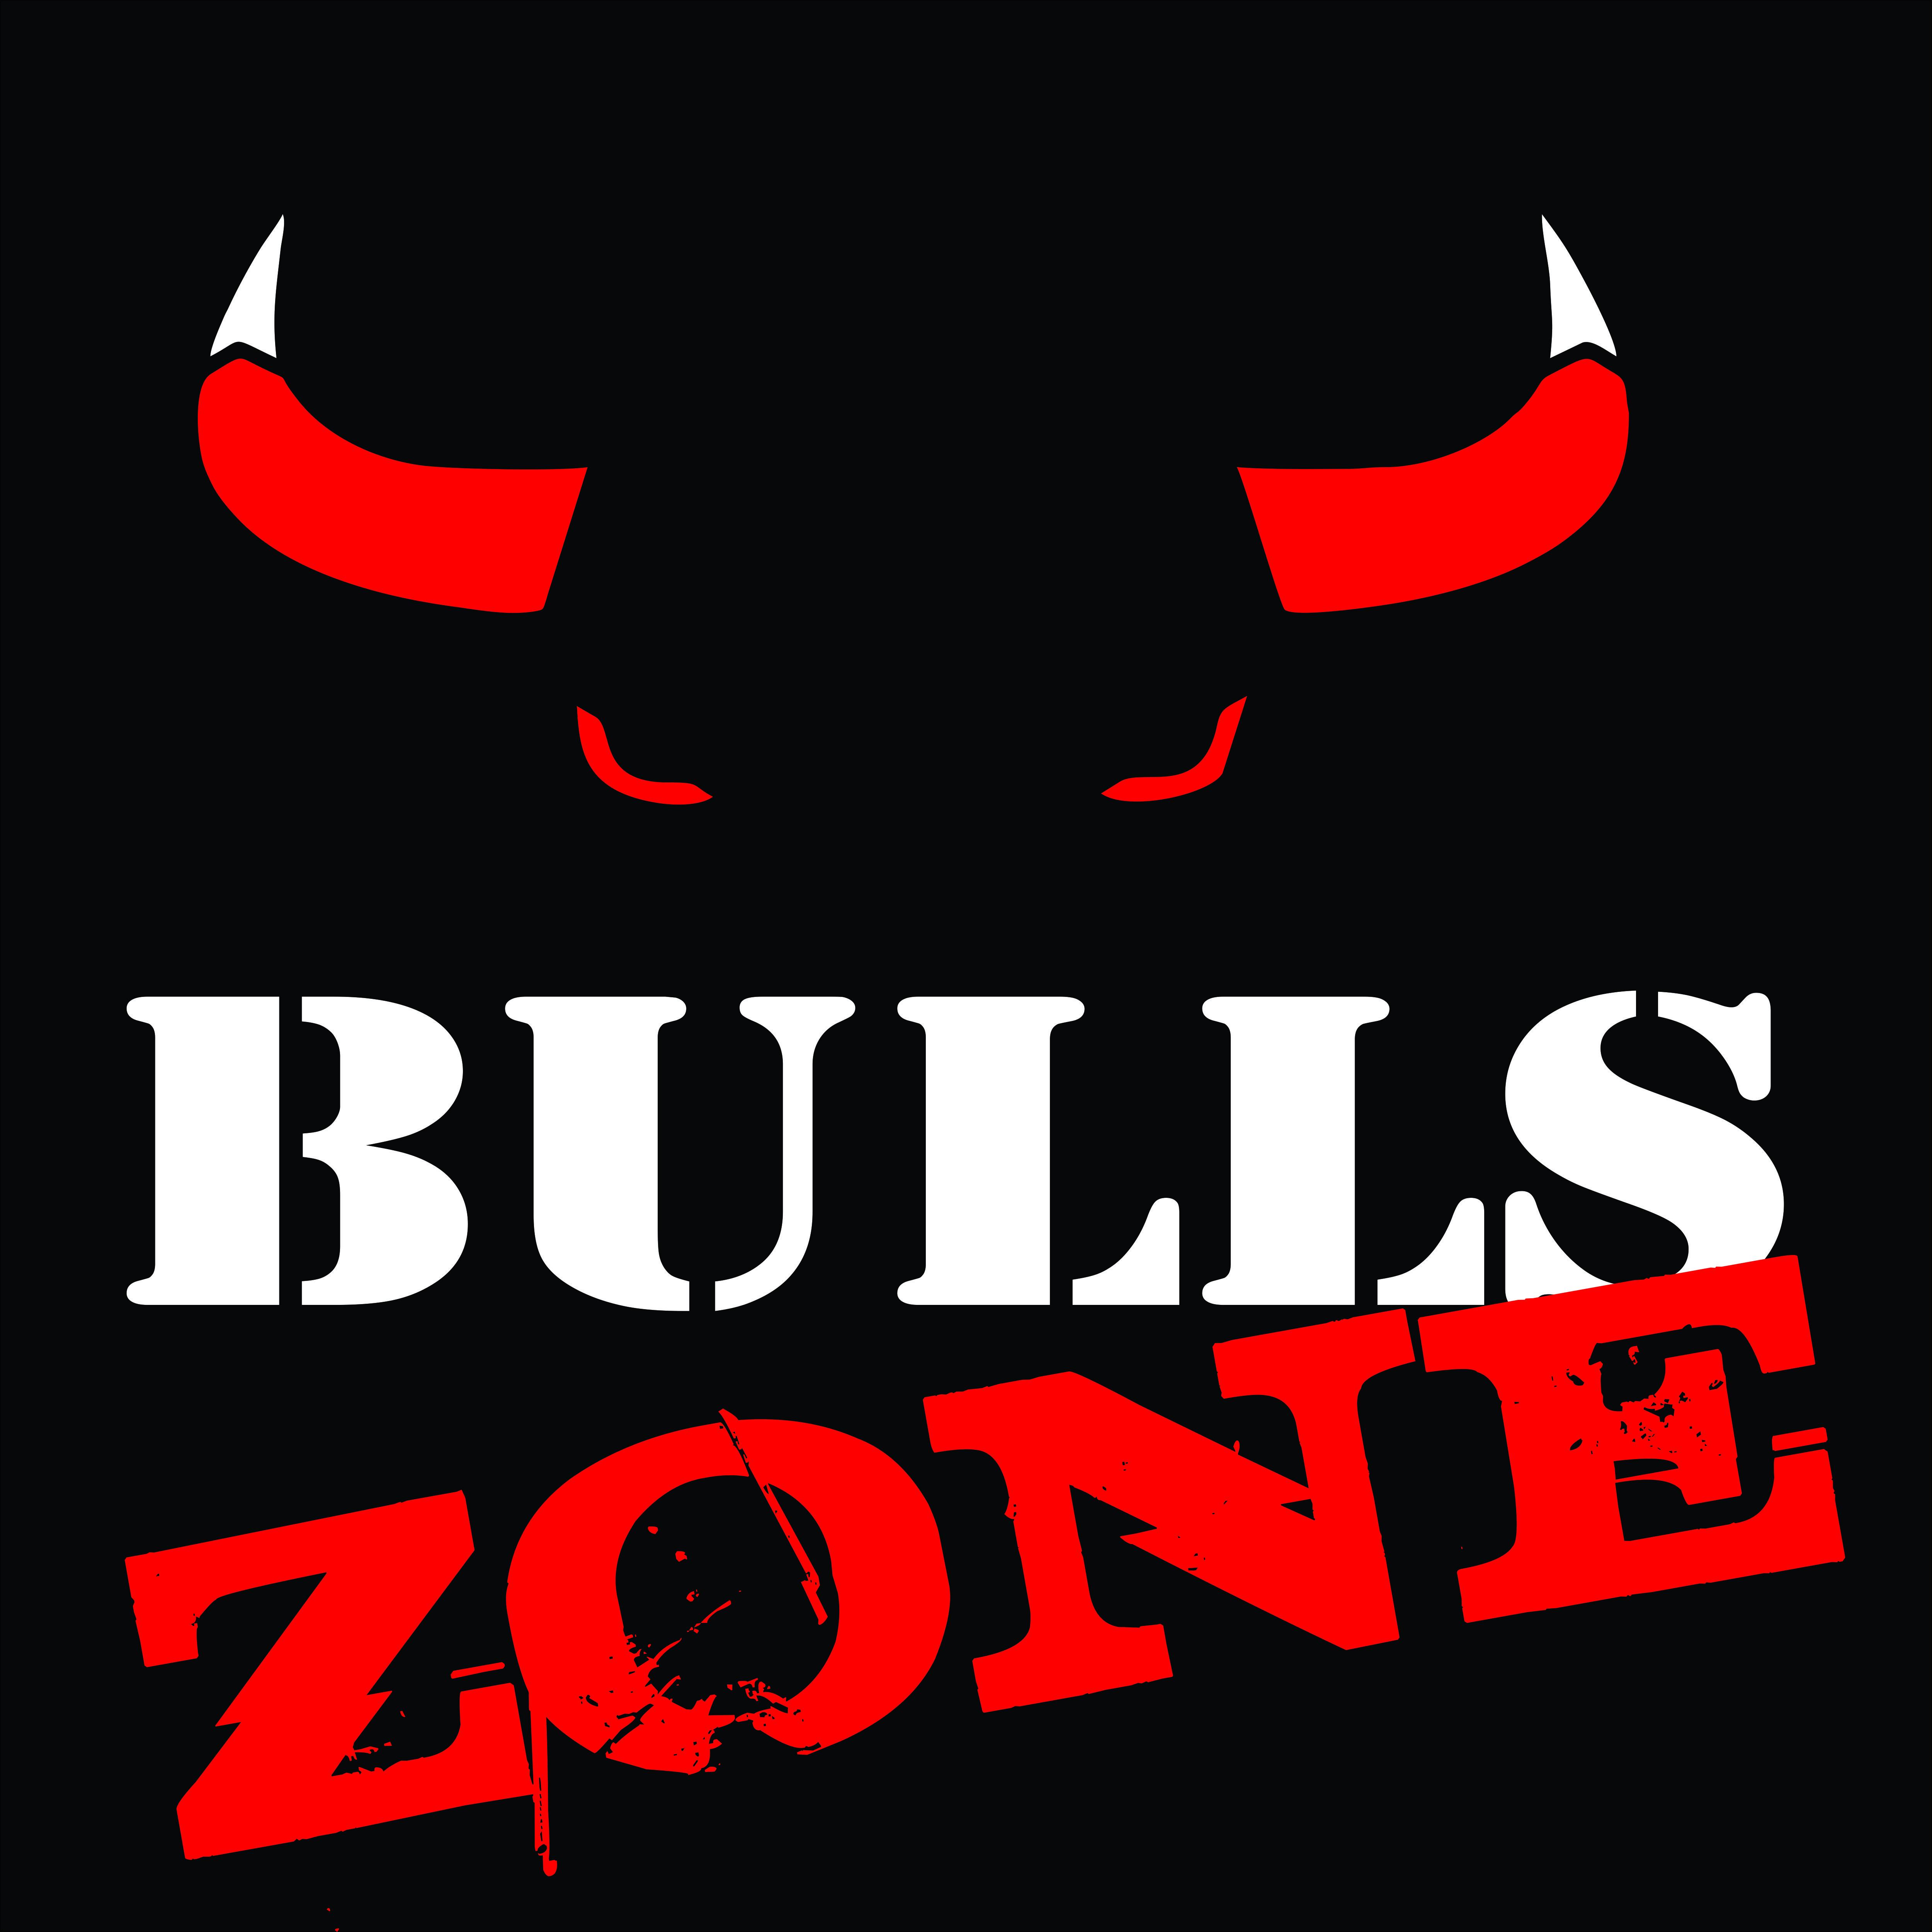 Red Bull clipart bul Horns Bulls 74 Bulls Clip